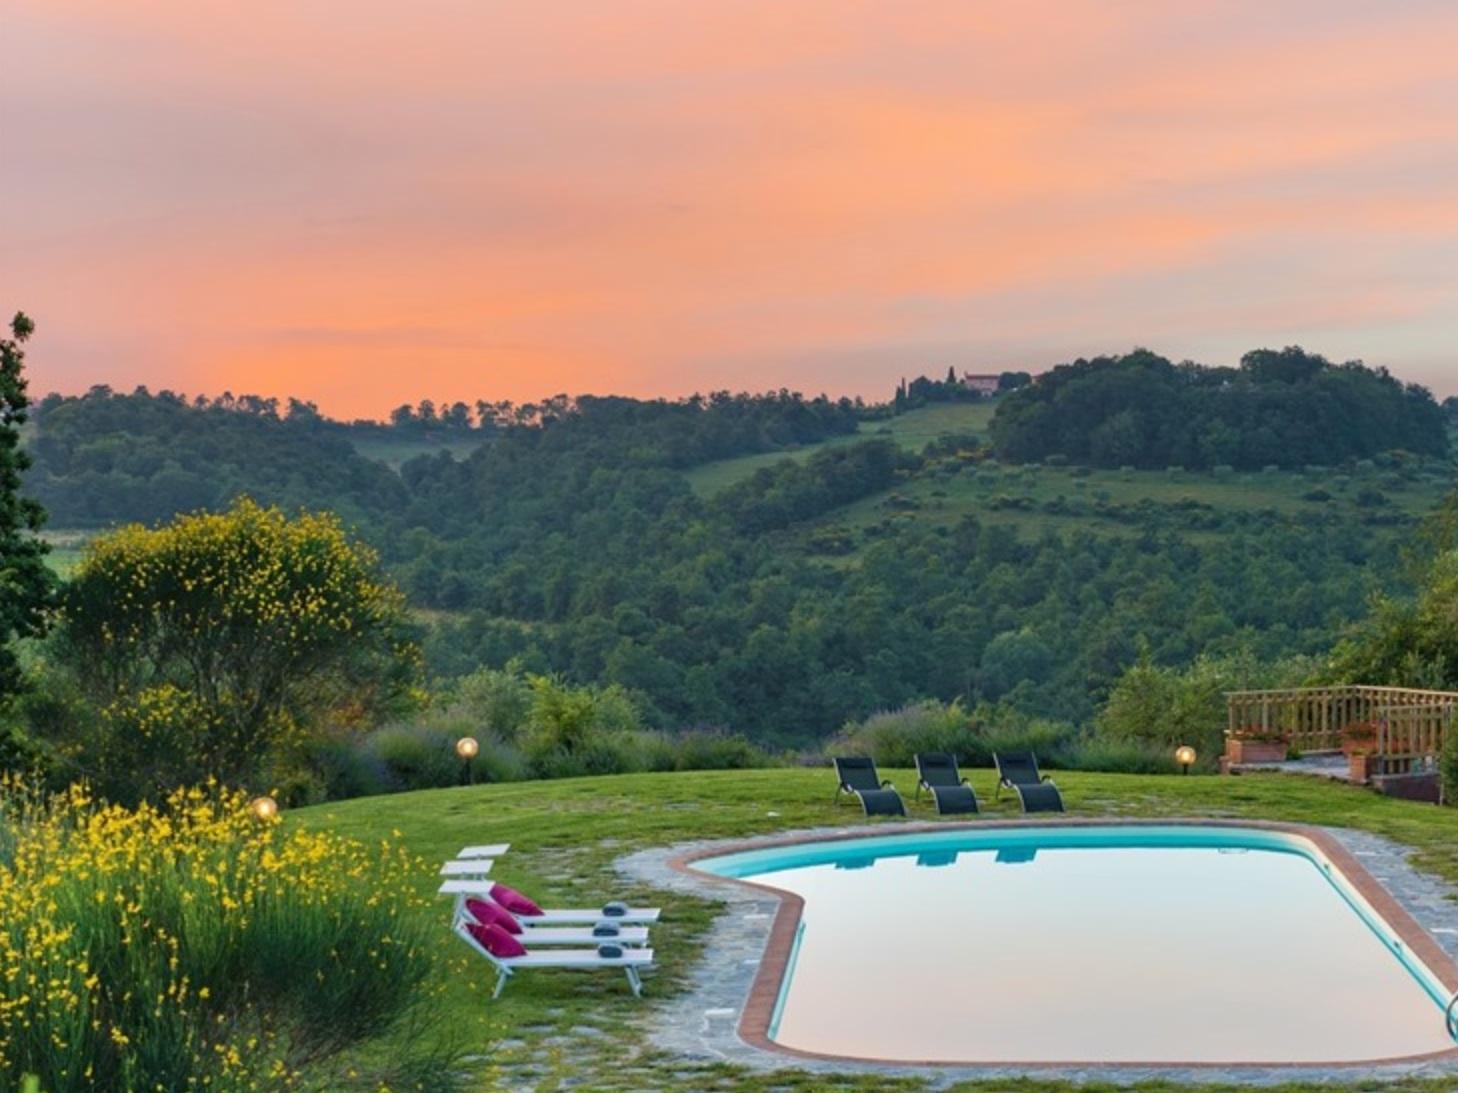 STONE CASALE - CITTÀ DELLA PIEVE - 4 BEDROOMS - 4 BATHWEEKLY PRICE FROM €1,877